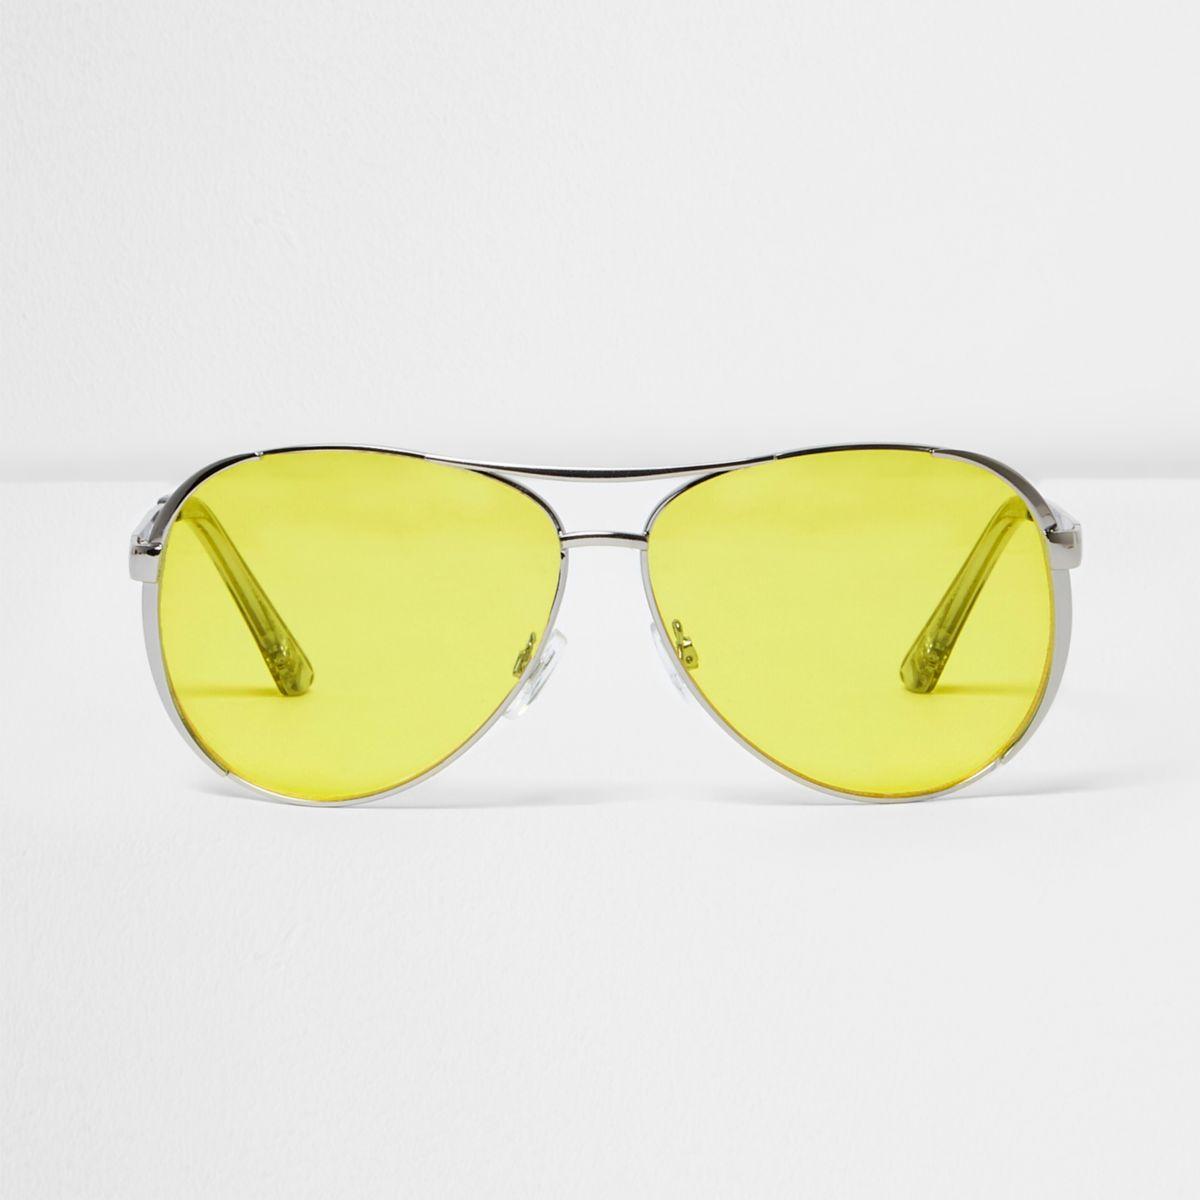 Silver tone yellow lens aviator sunglasses